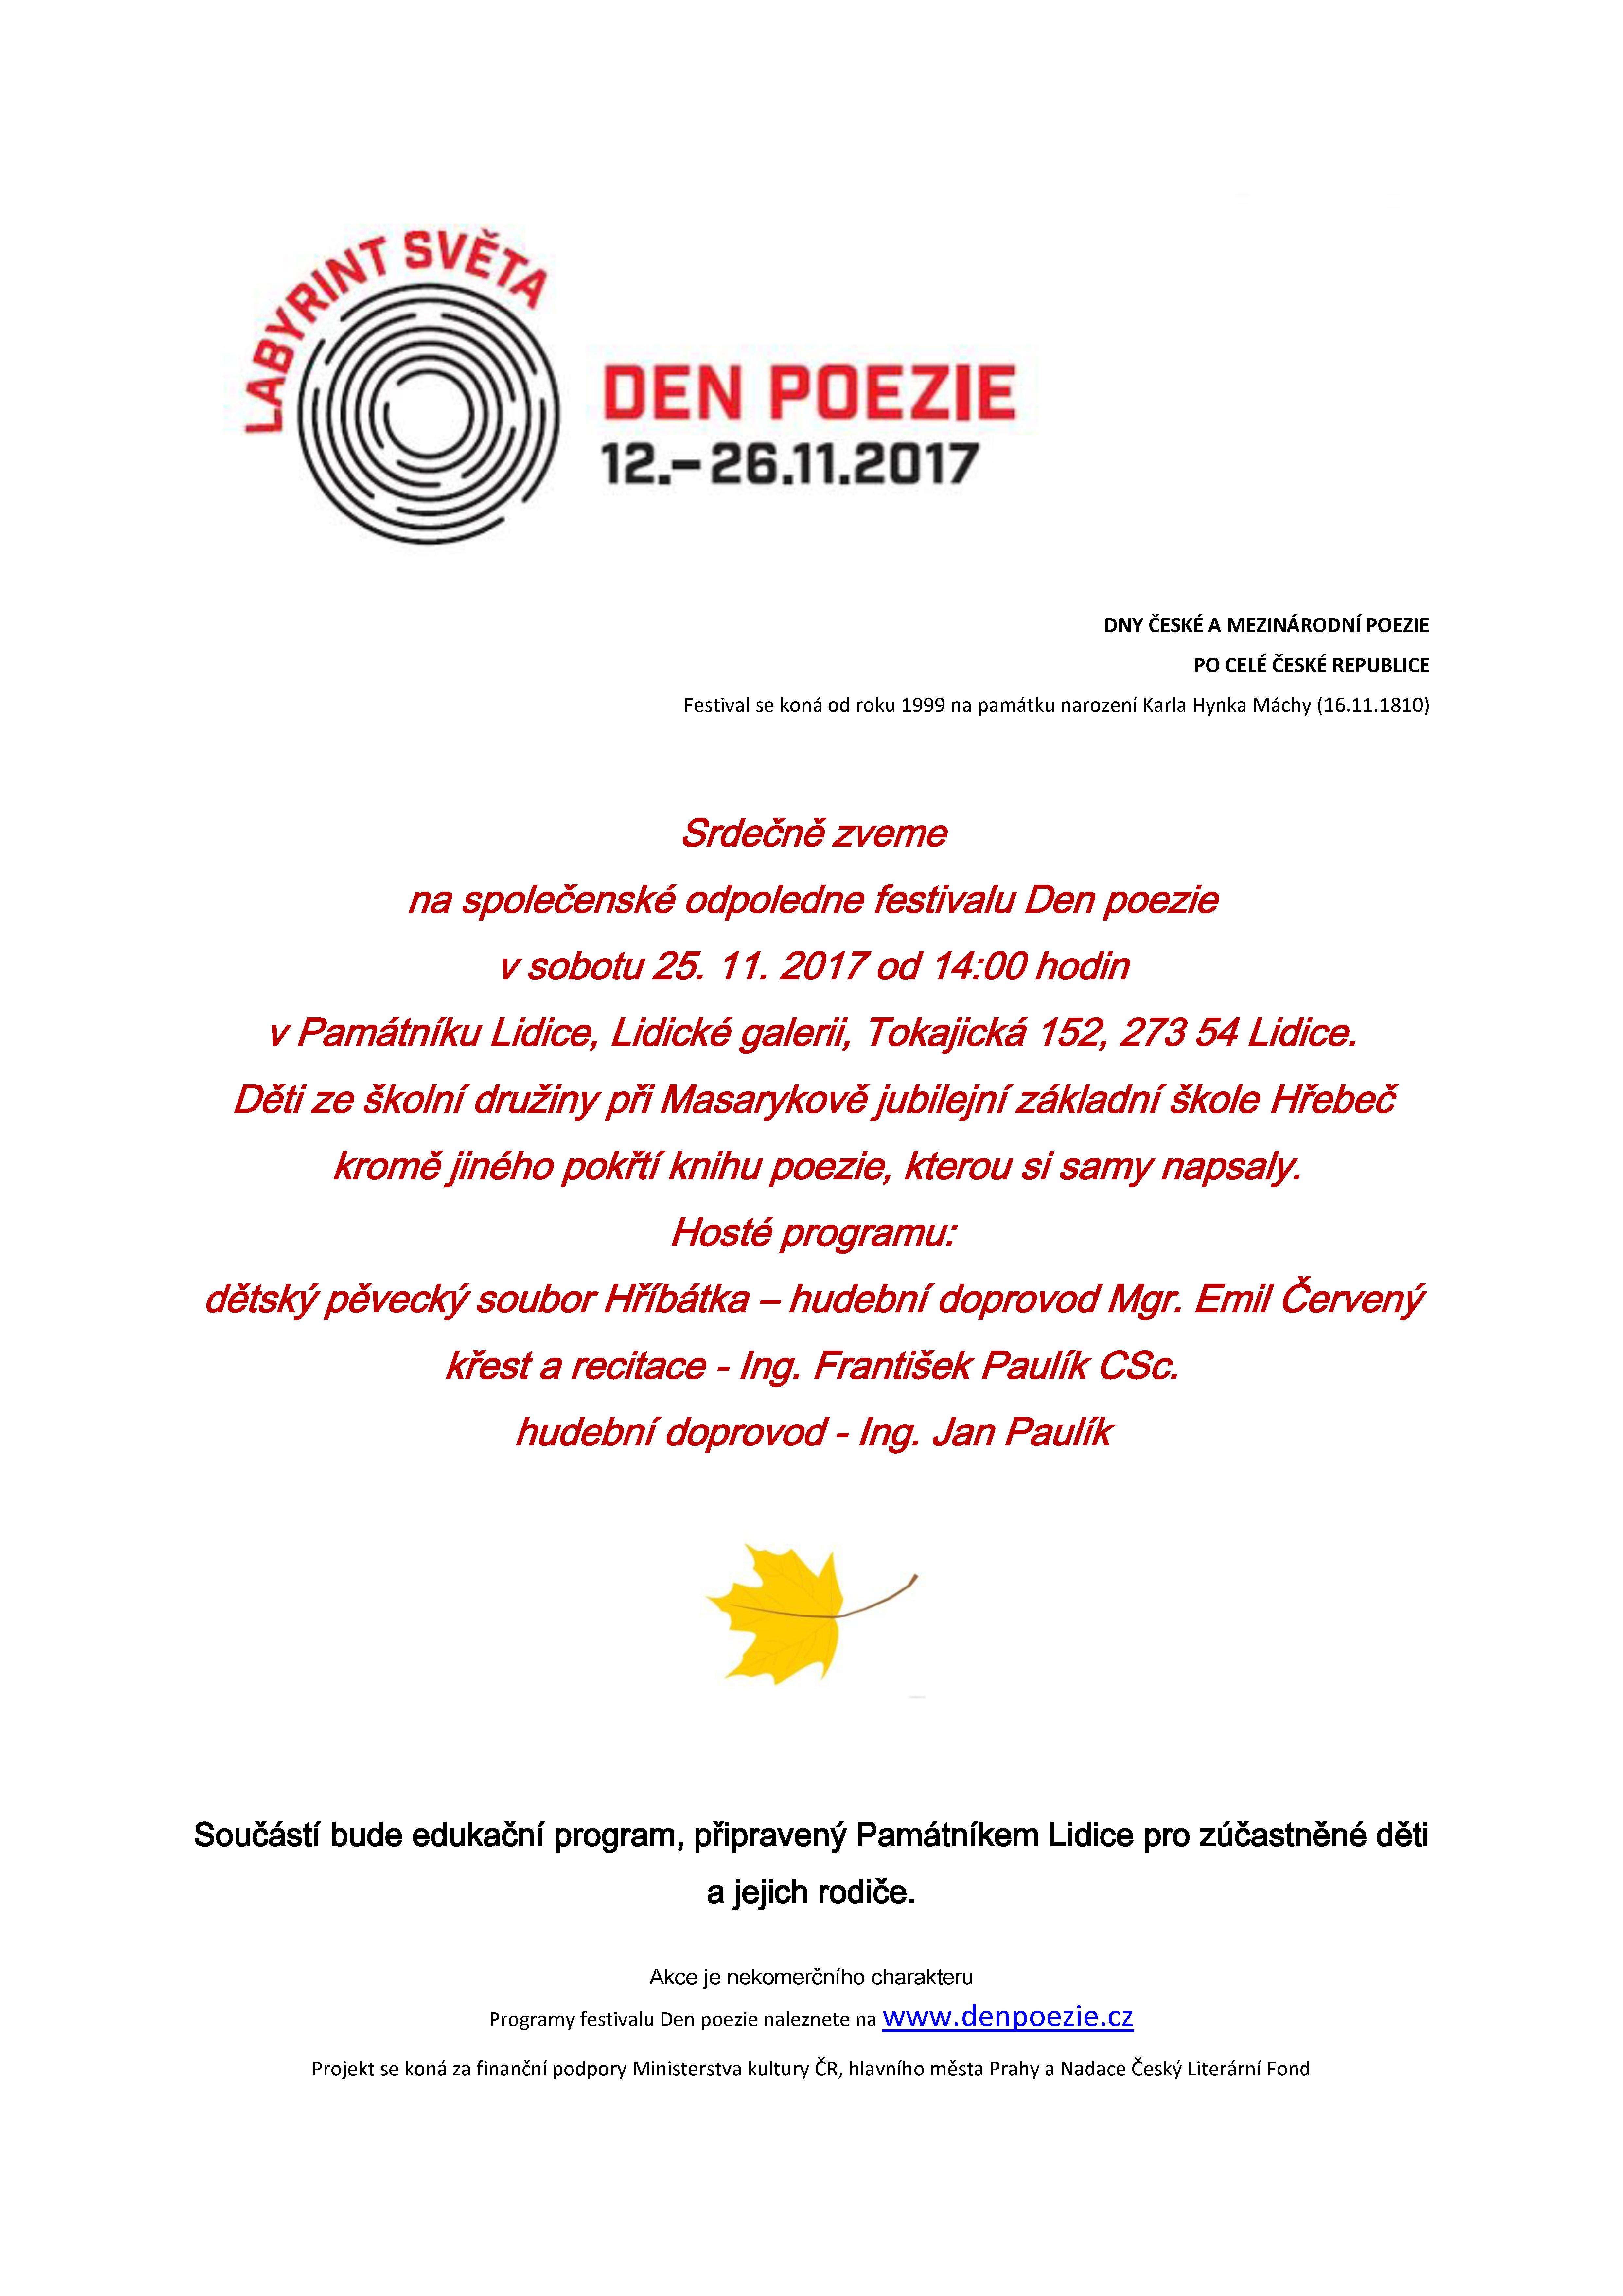 20171106 den poezie pozvánka do Lidic